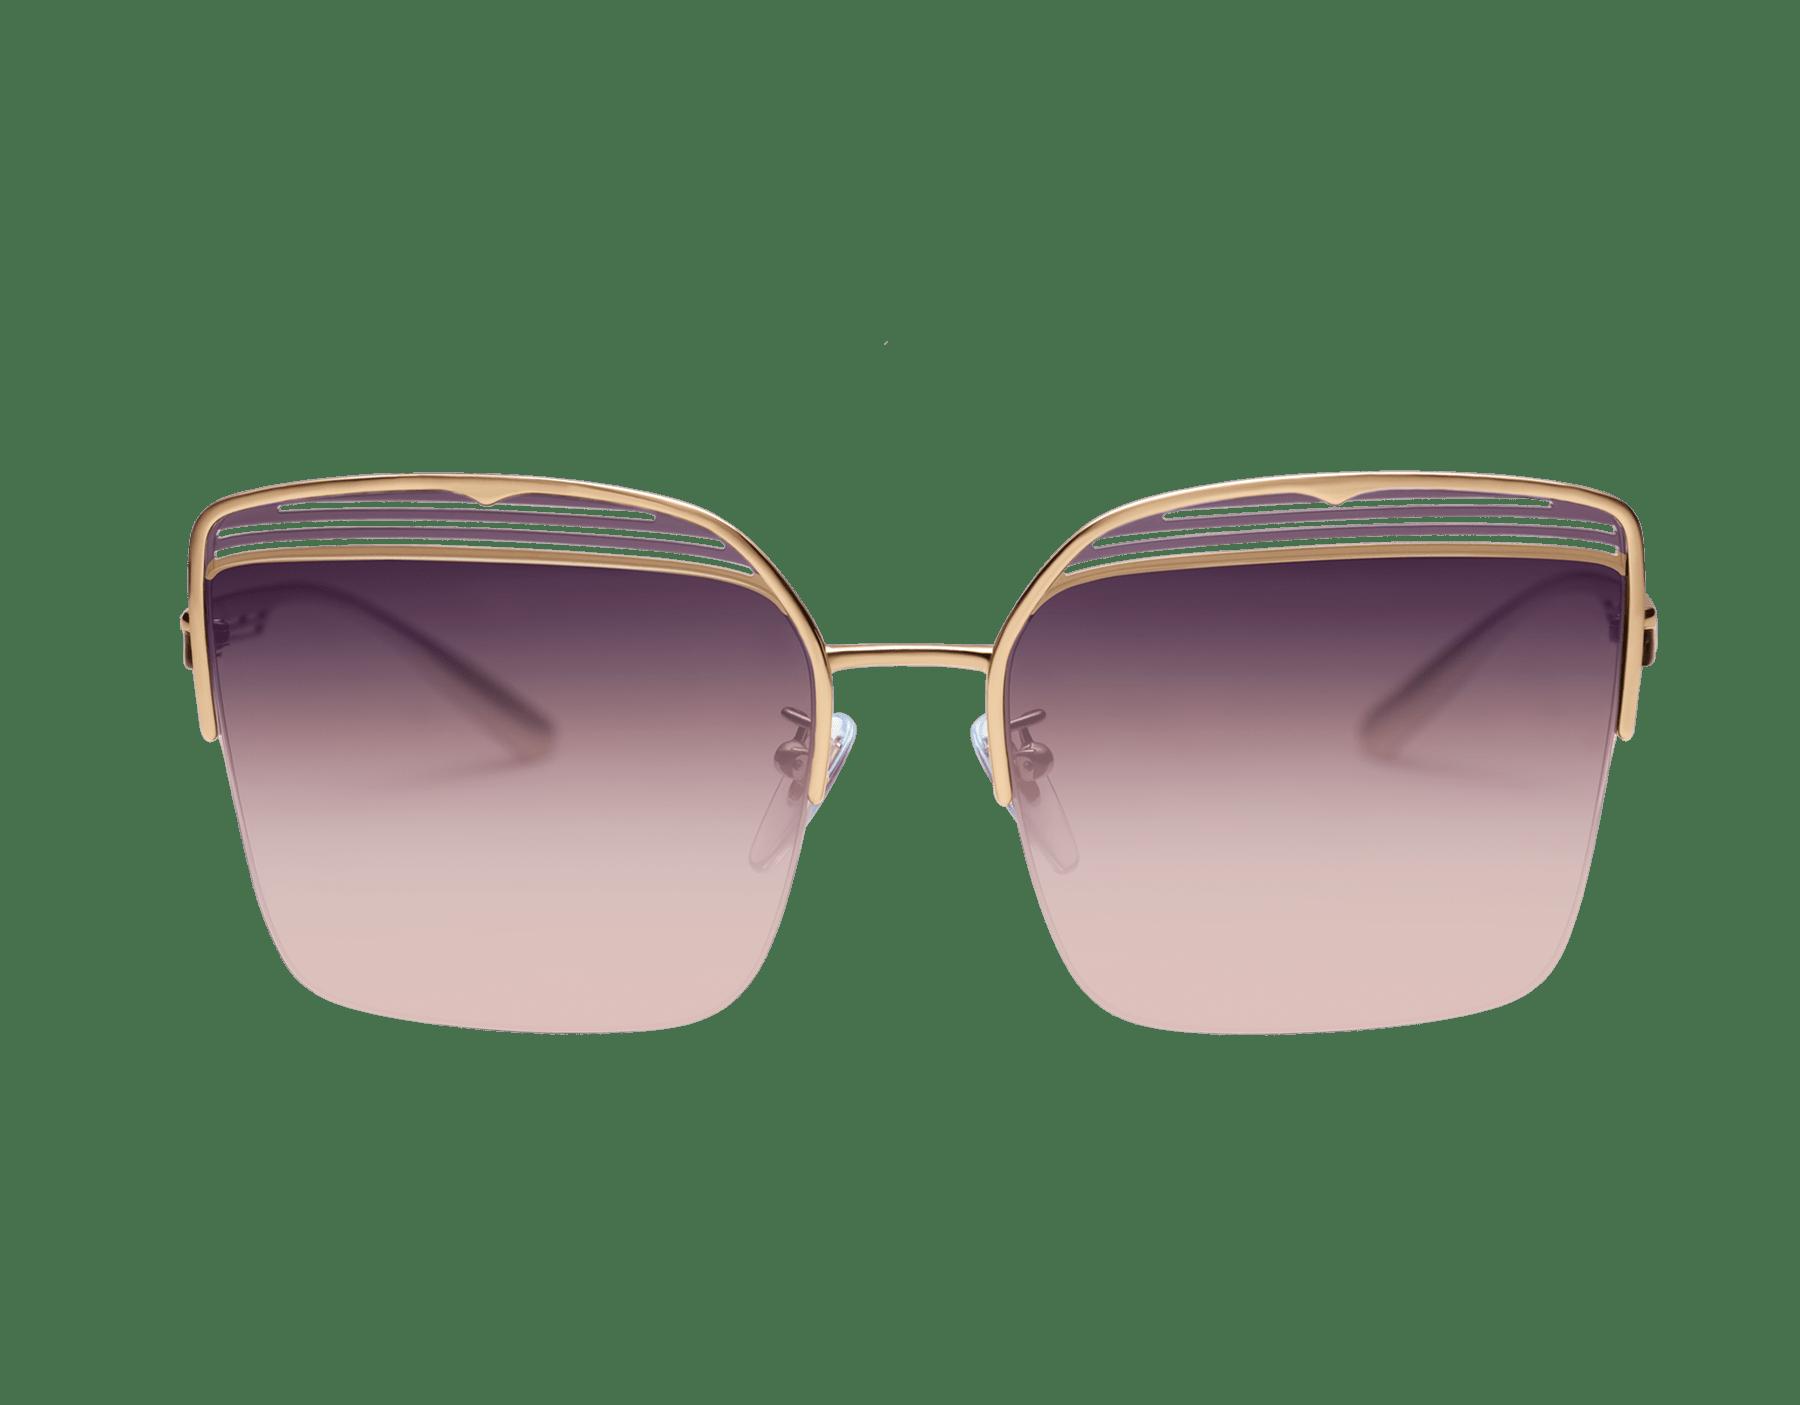 Bvlgari B.zero1 B.overvibe half-rim square metal sunglasses. 903813 image 2